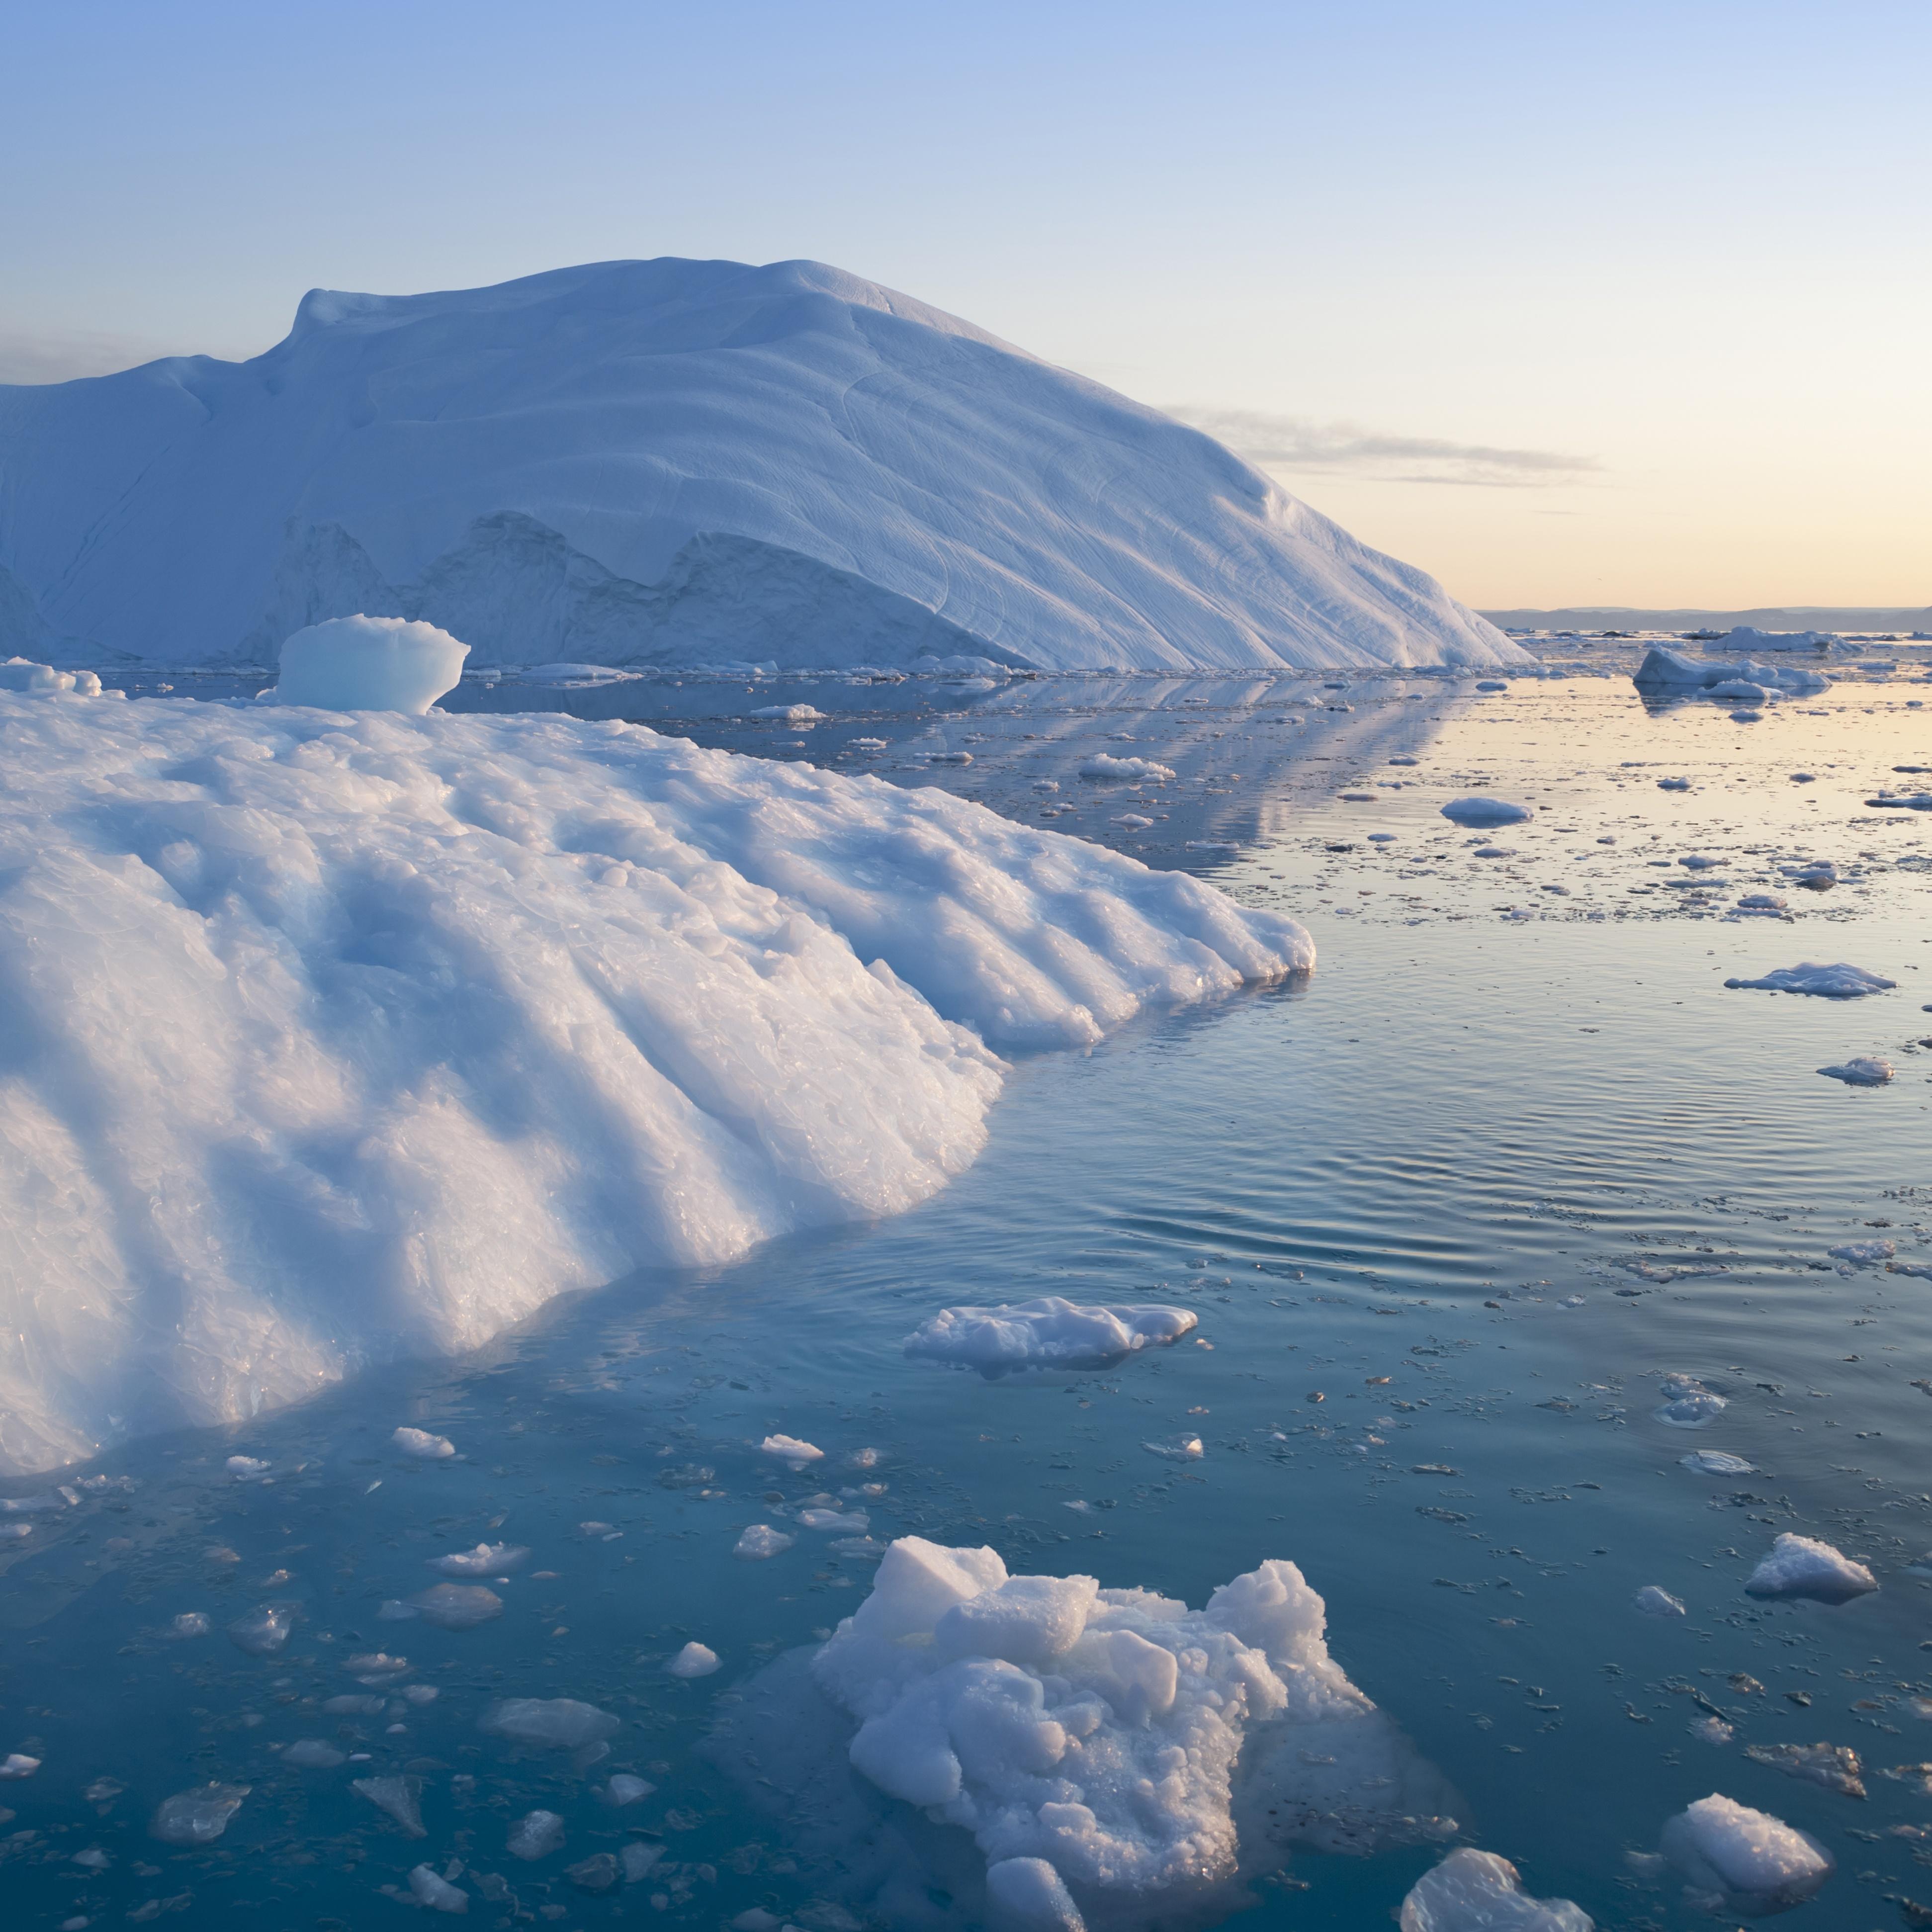 antarcticlandscape2.jpg